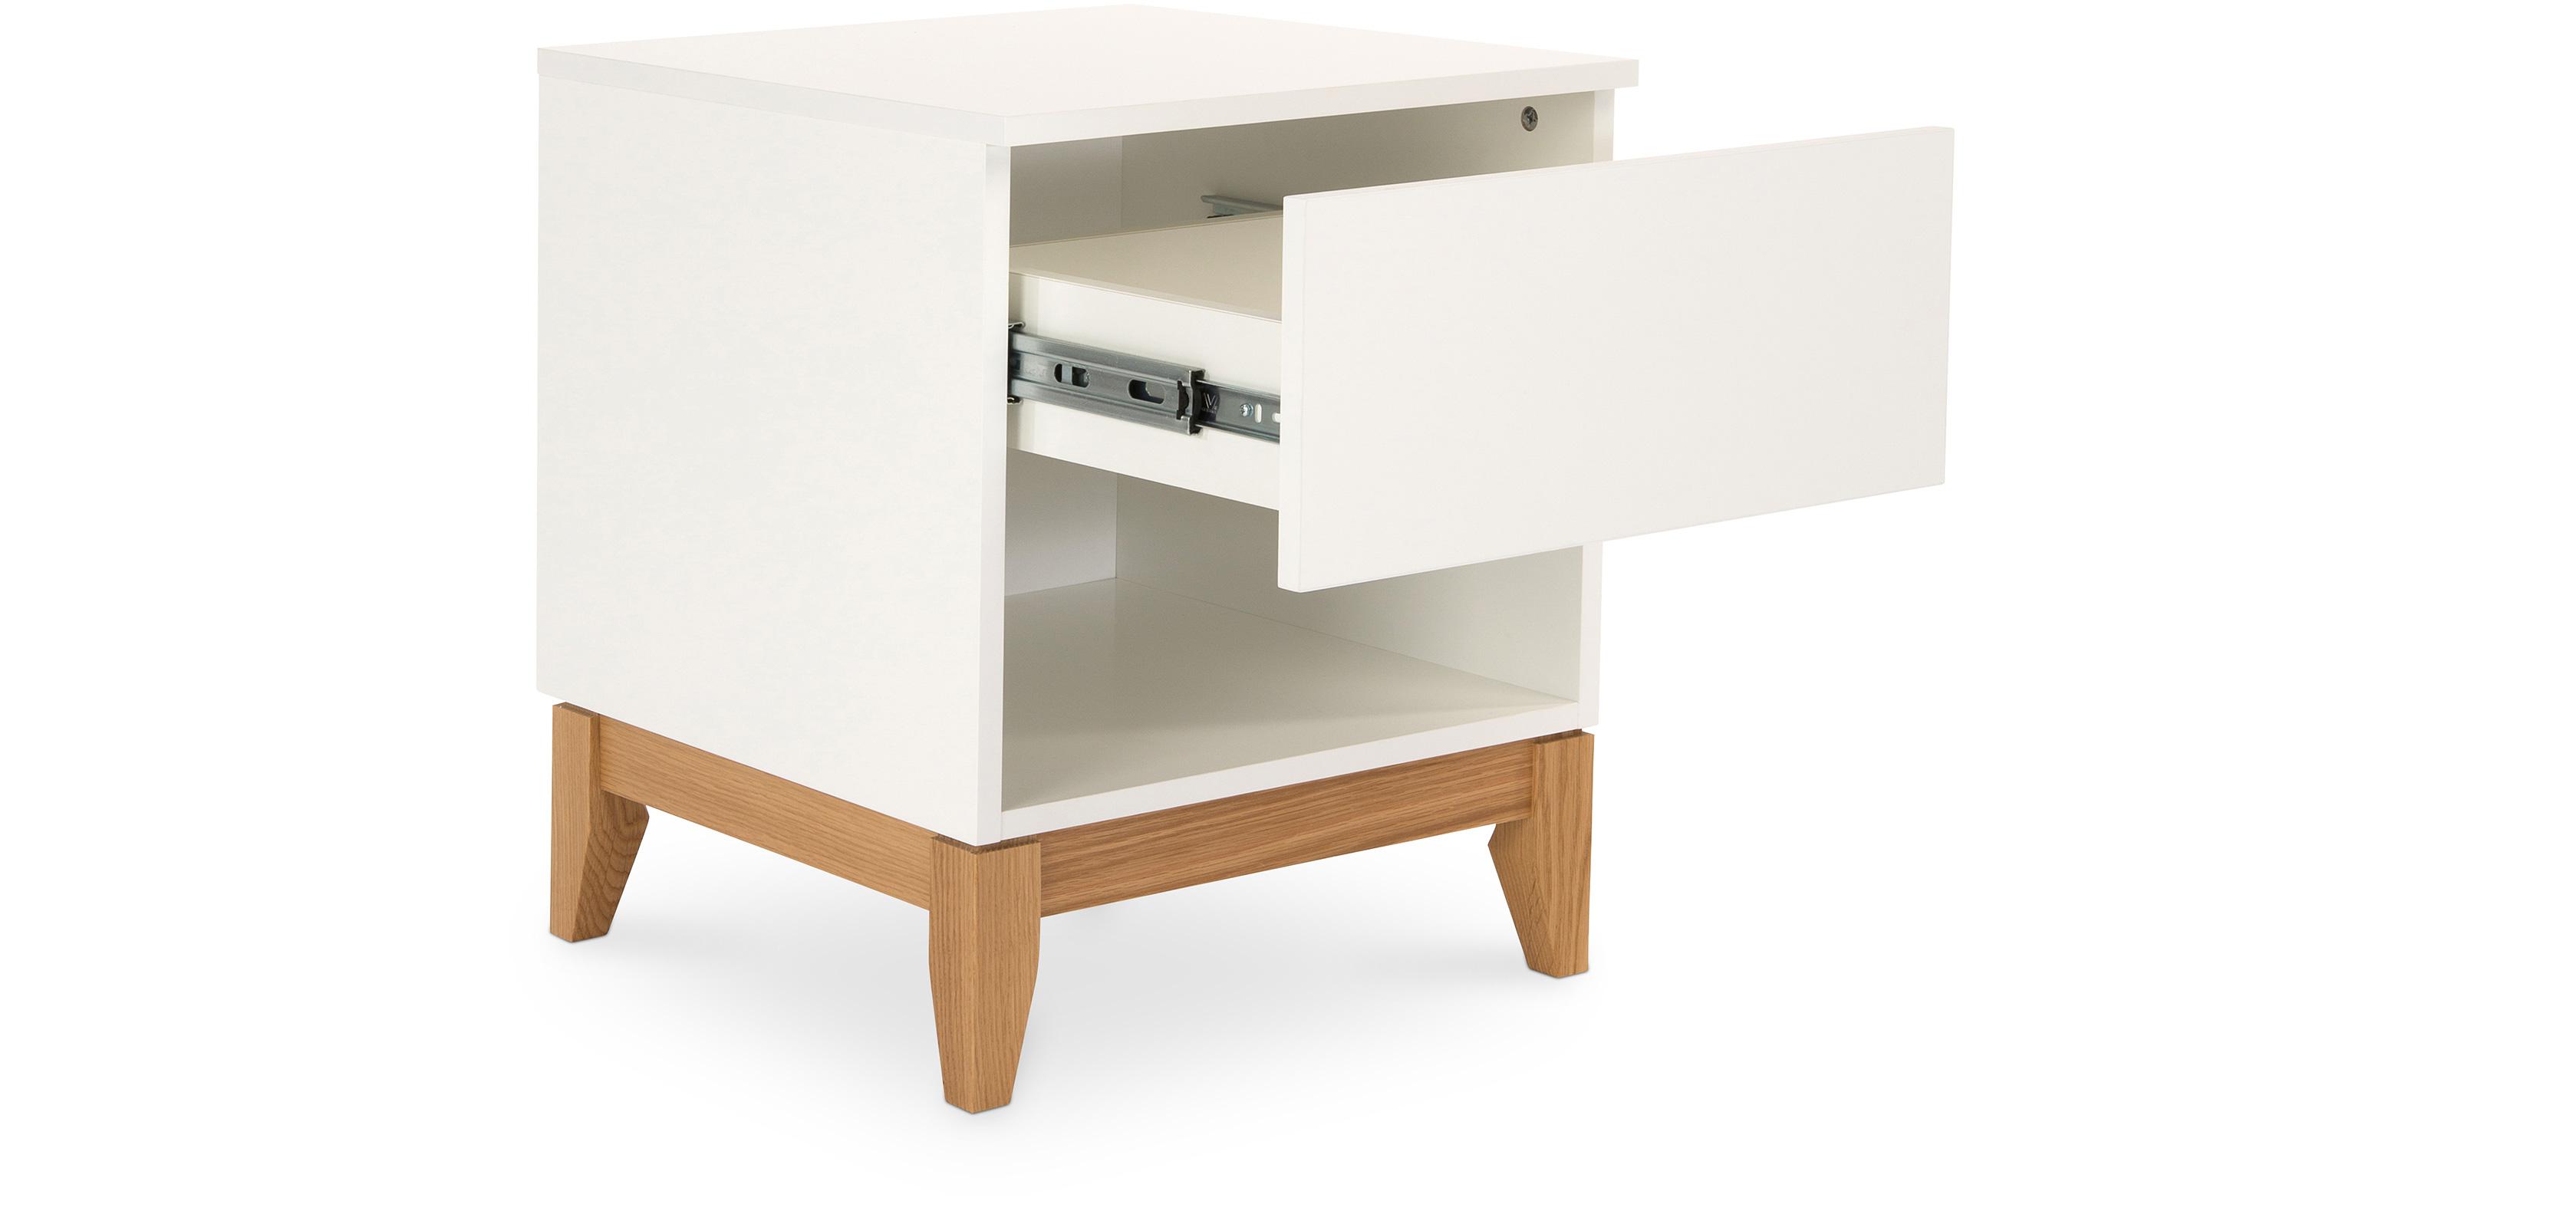 table de nuit style scandinave miurem. Black Bedroom Furniture Sets. Home Design Ideas